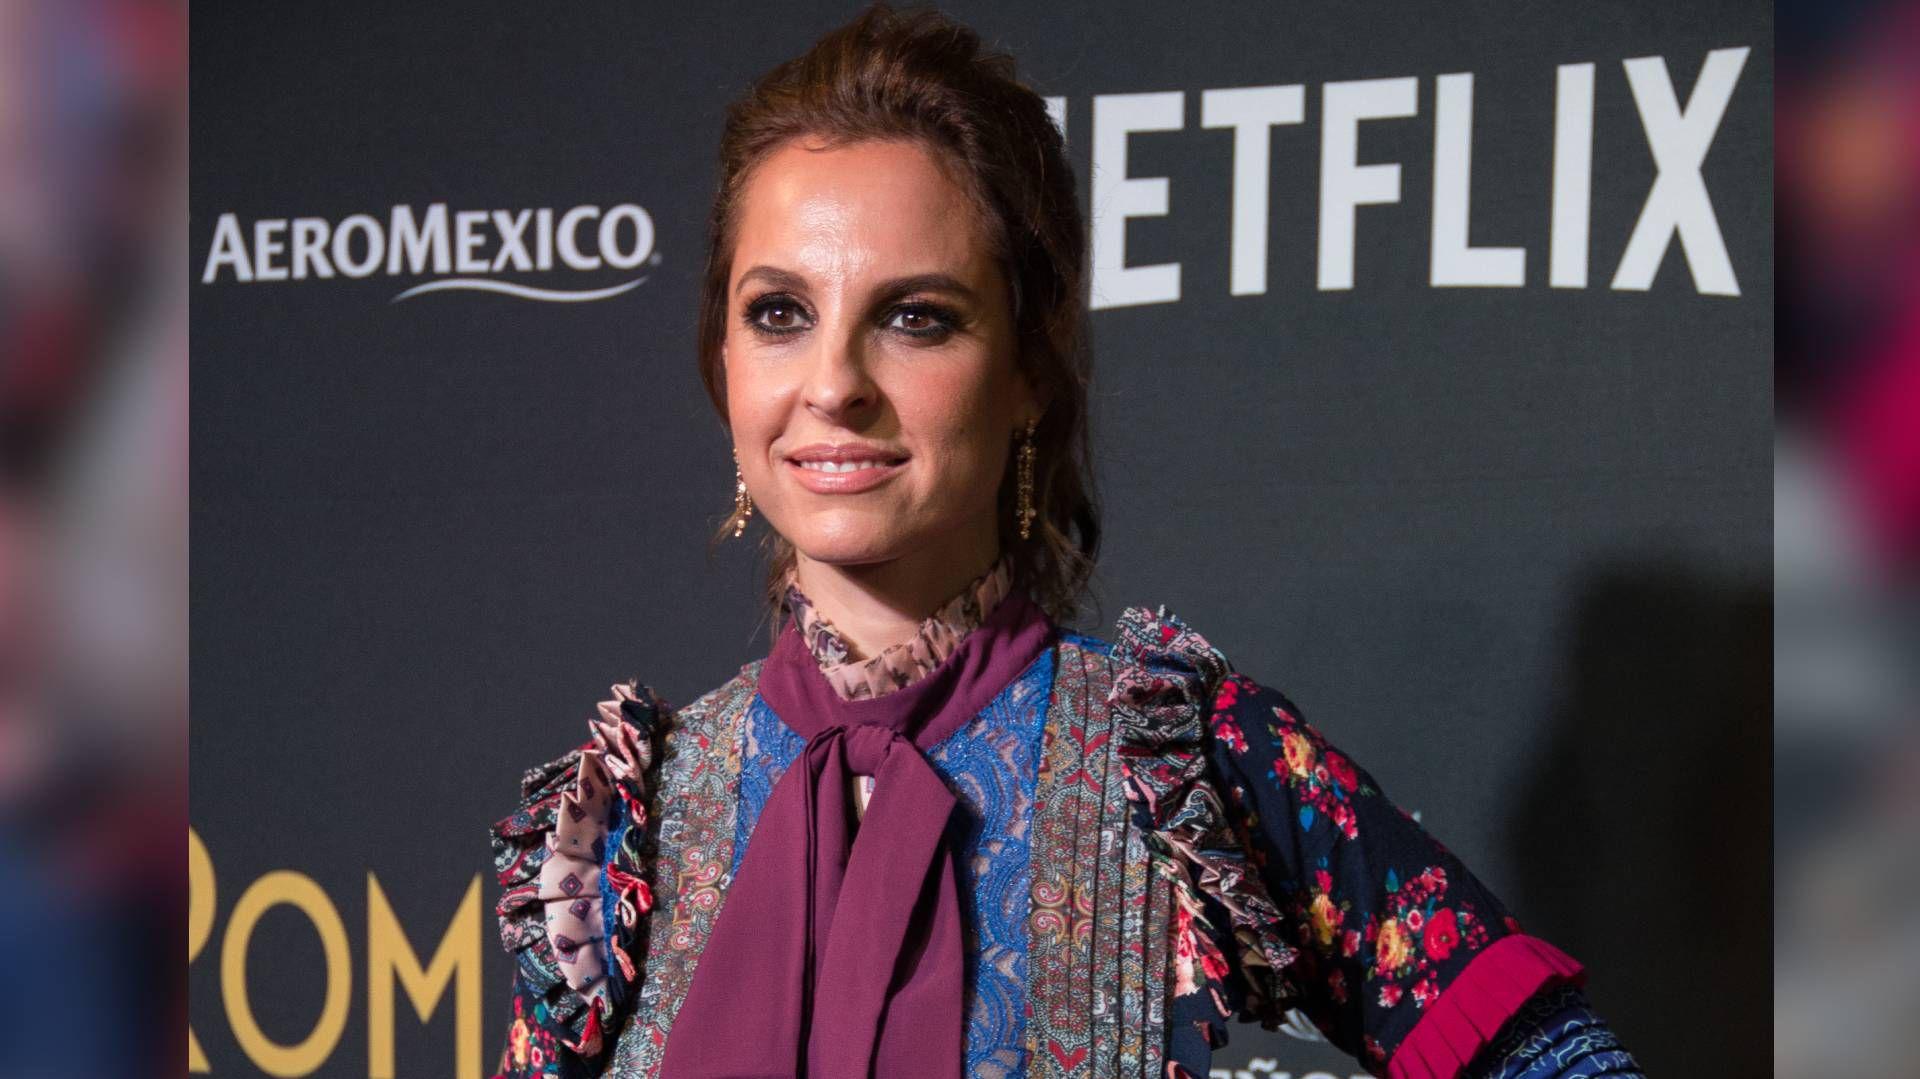 Marina de Tavira estuvo nominada al Oscar por Roma de Alfonso Cuarón (Foto: Andrea Murcia / Cuartoscuro)